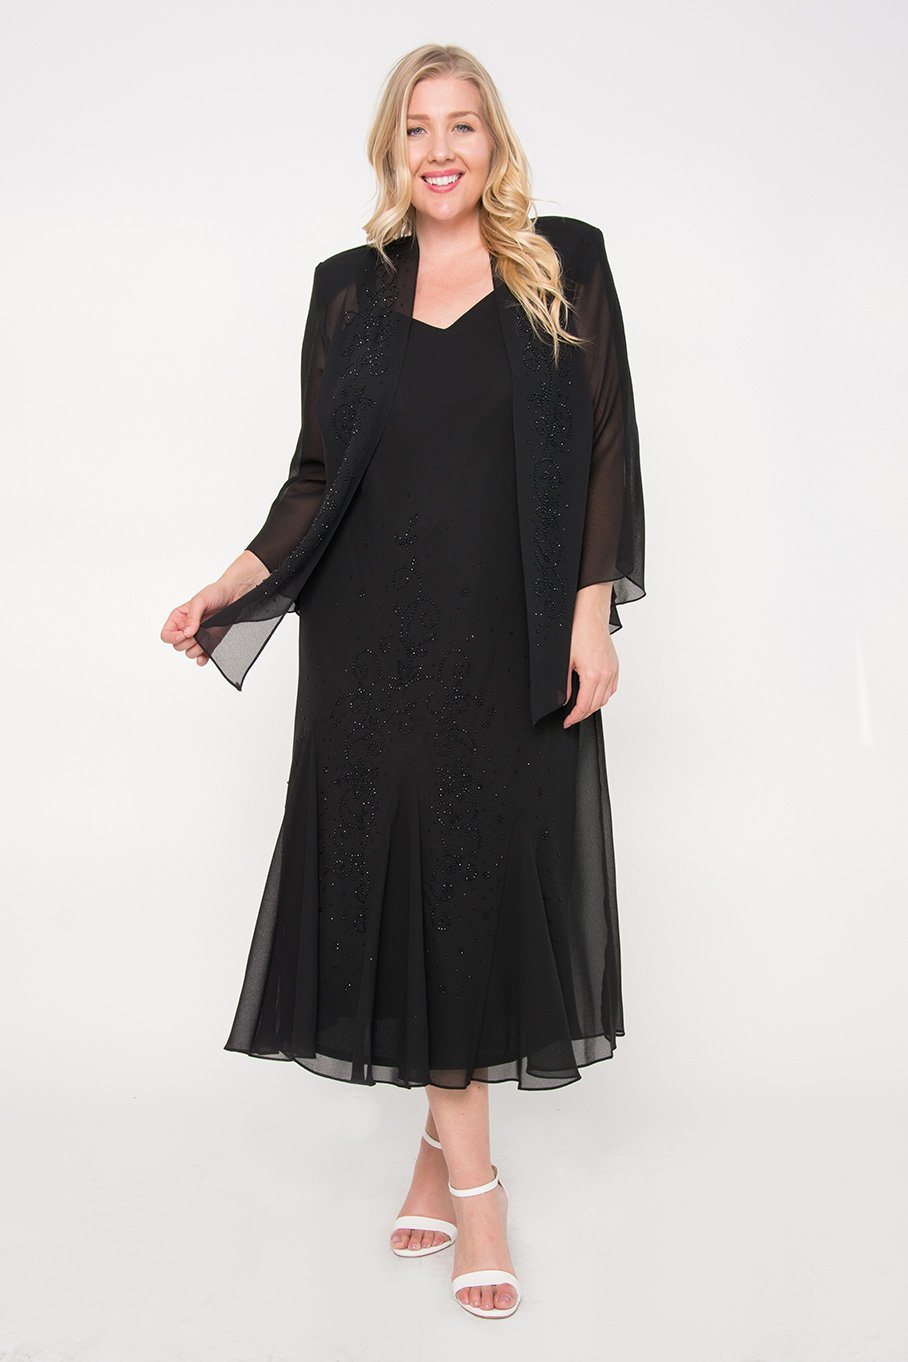 Black Plus Size Mother Of The Bride Dresses